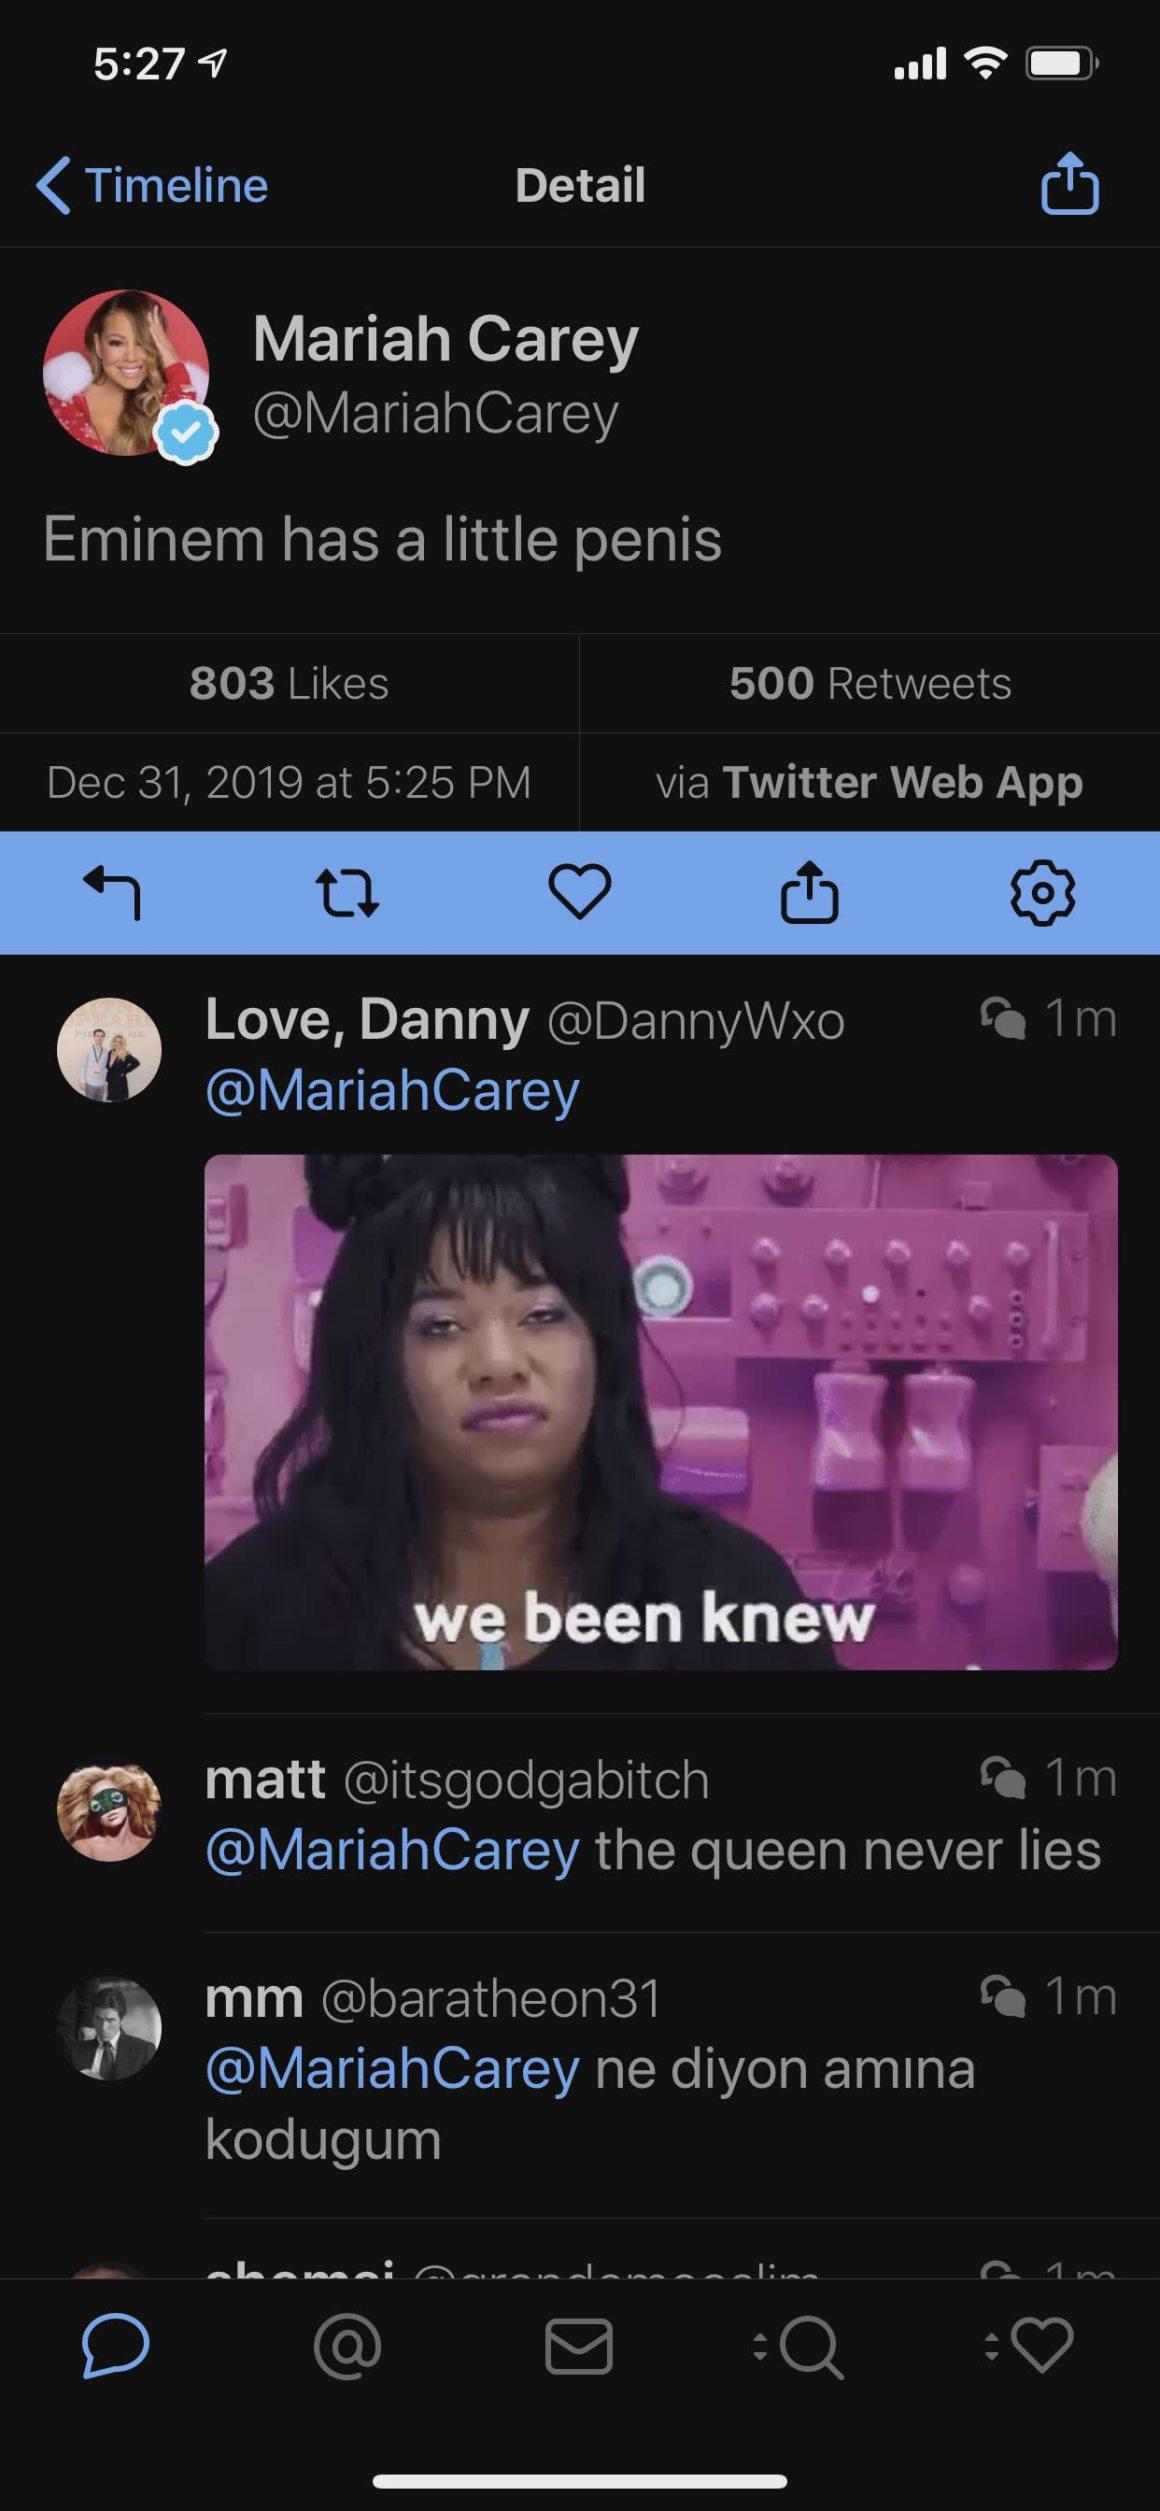 Mariah Carey Hacked Tweet